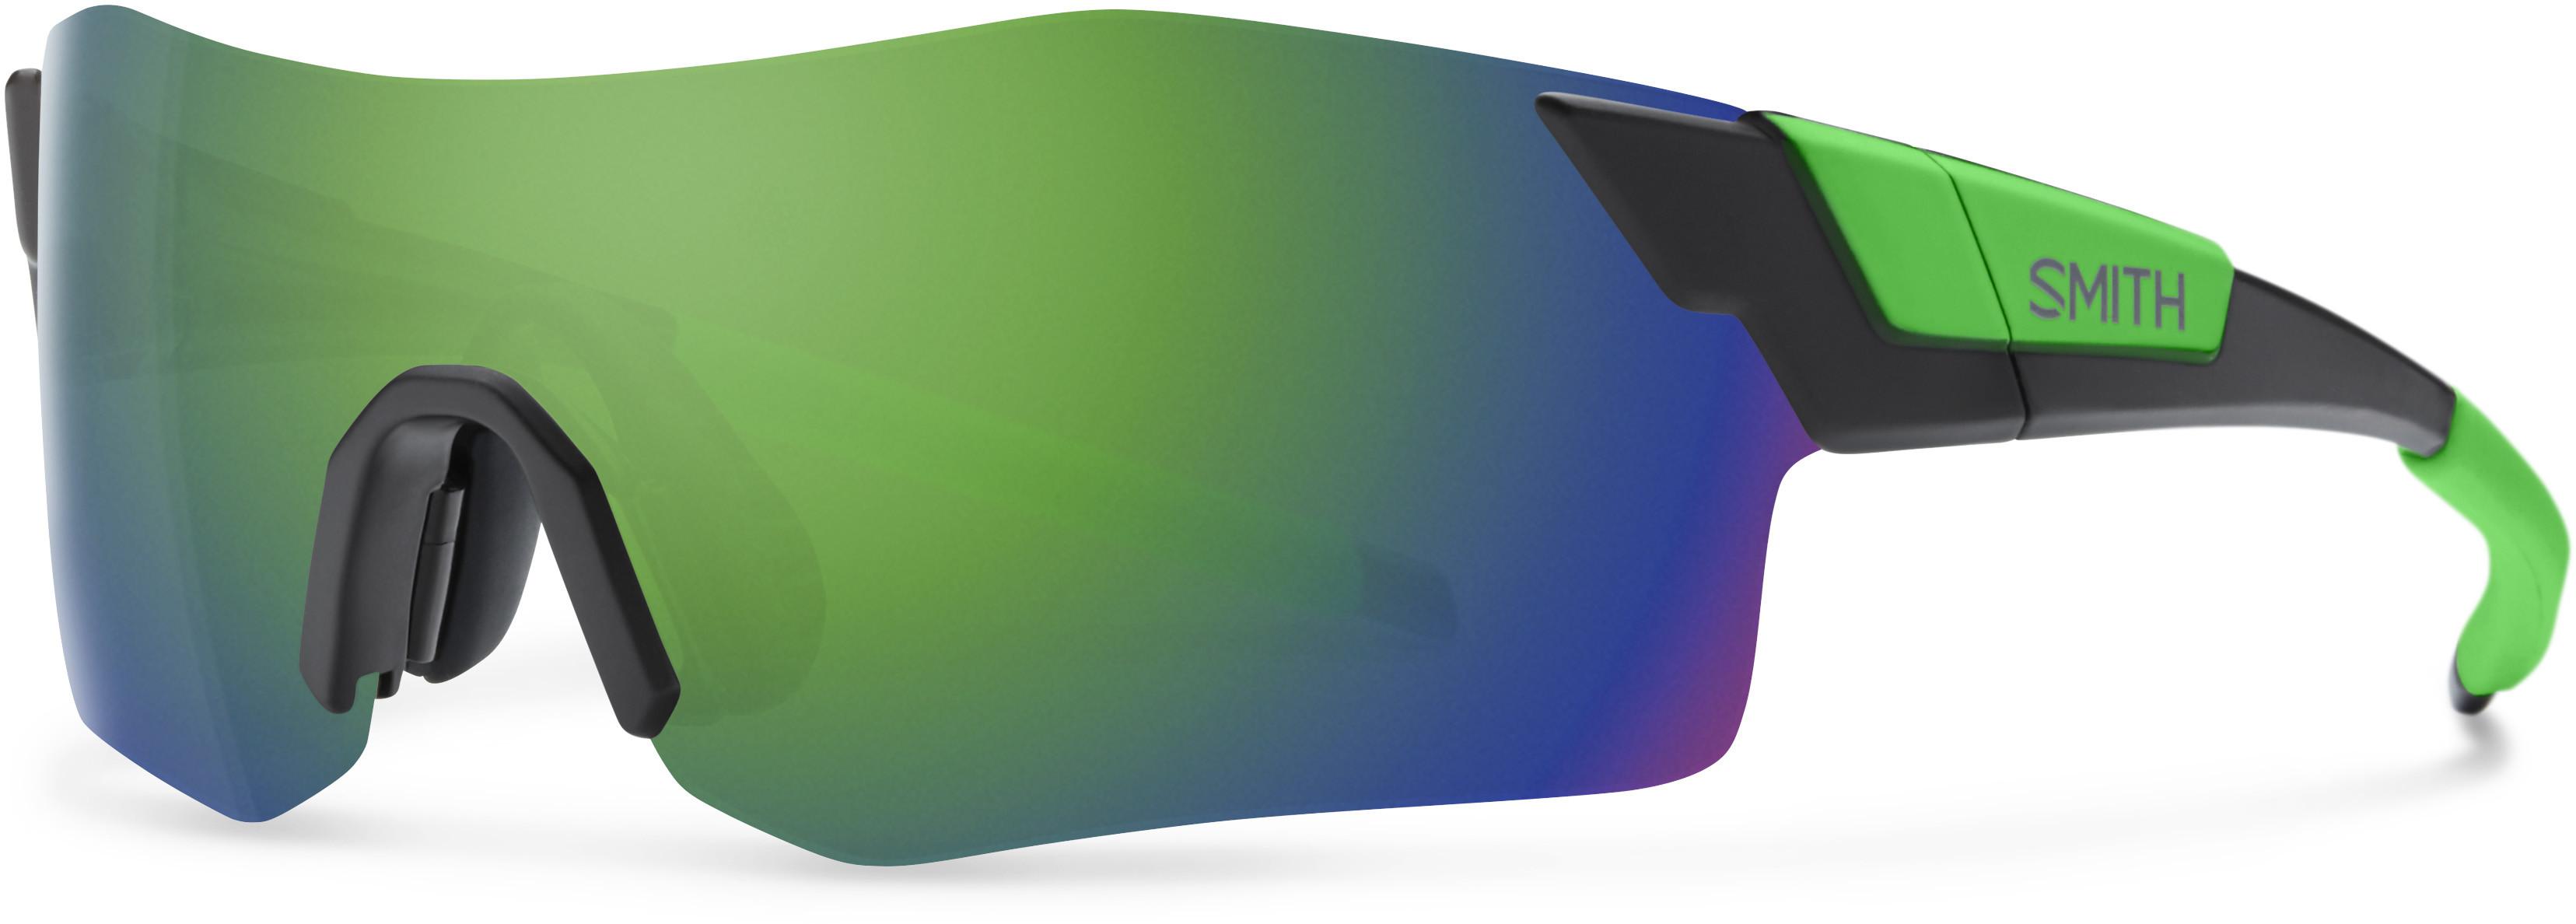 24f8ef6e03 Smith Optics Pivlock Arena Sunglasses